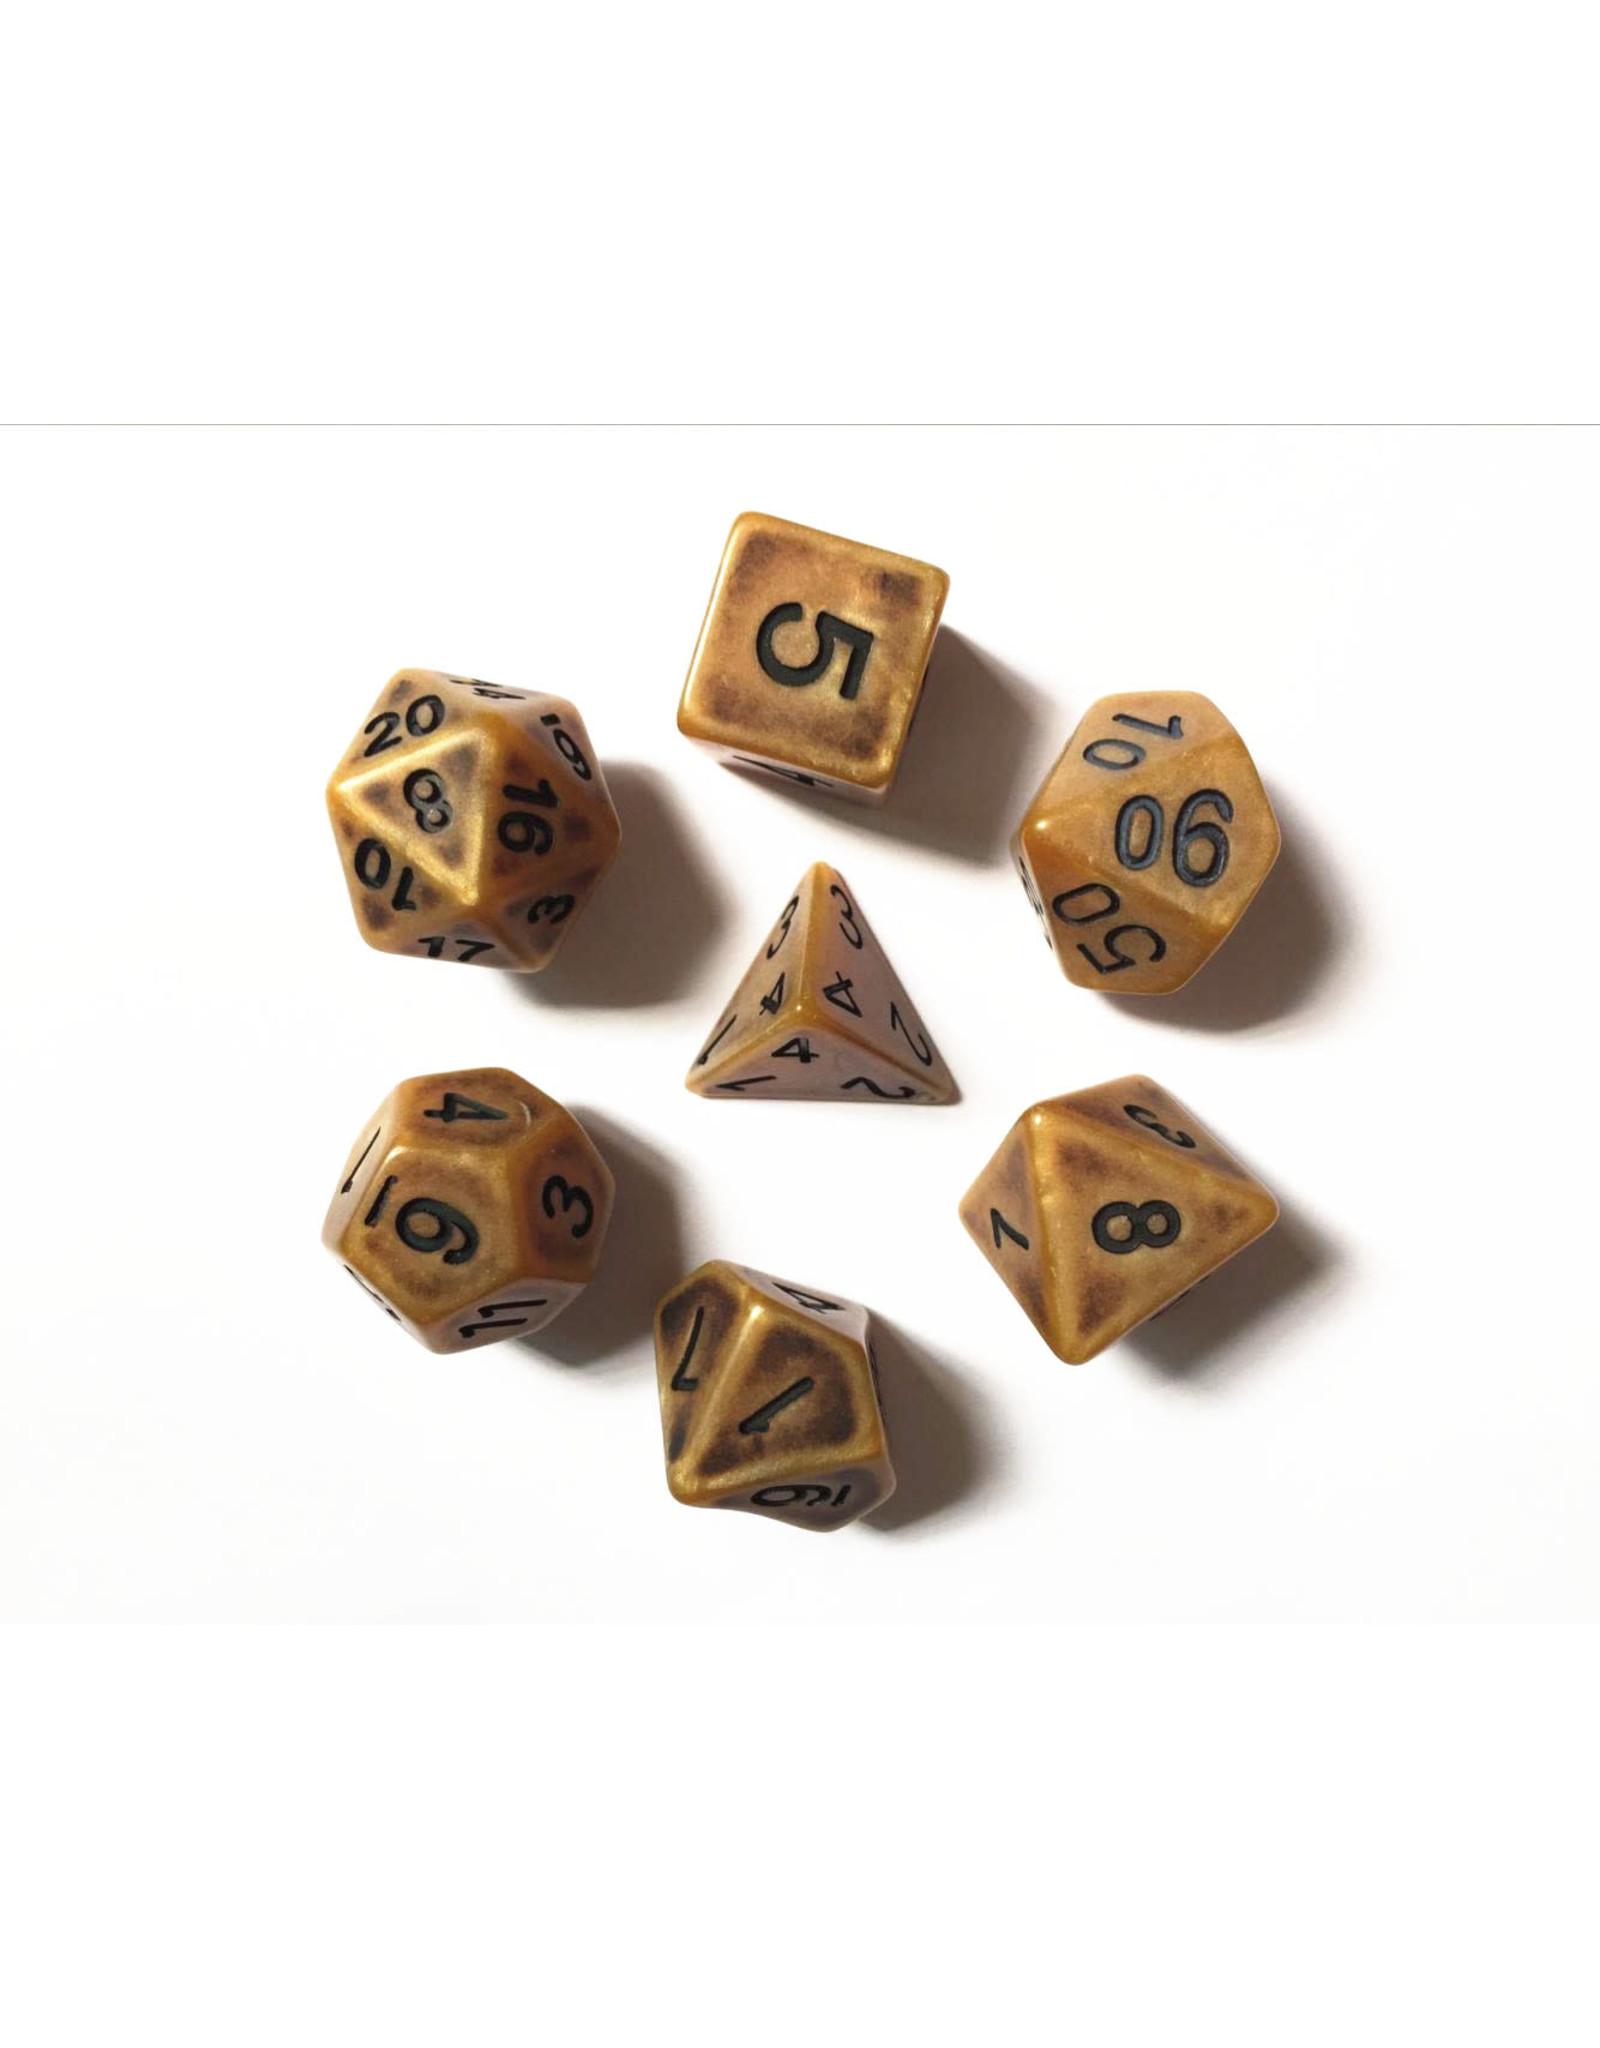 Dice Set  - Ancient Gold